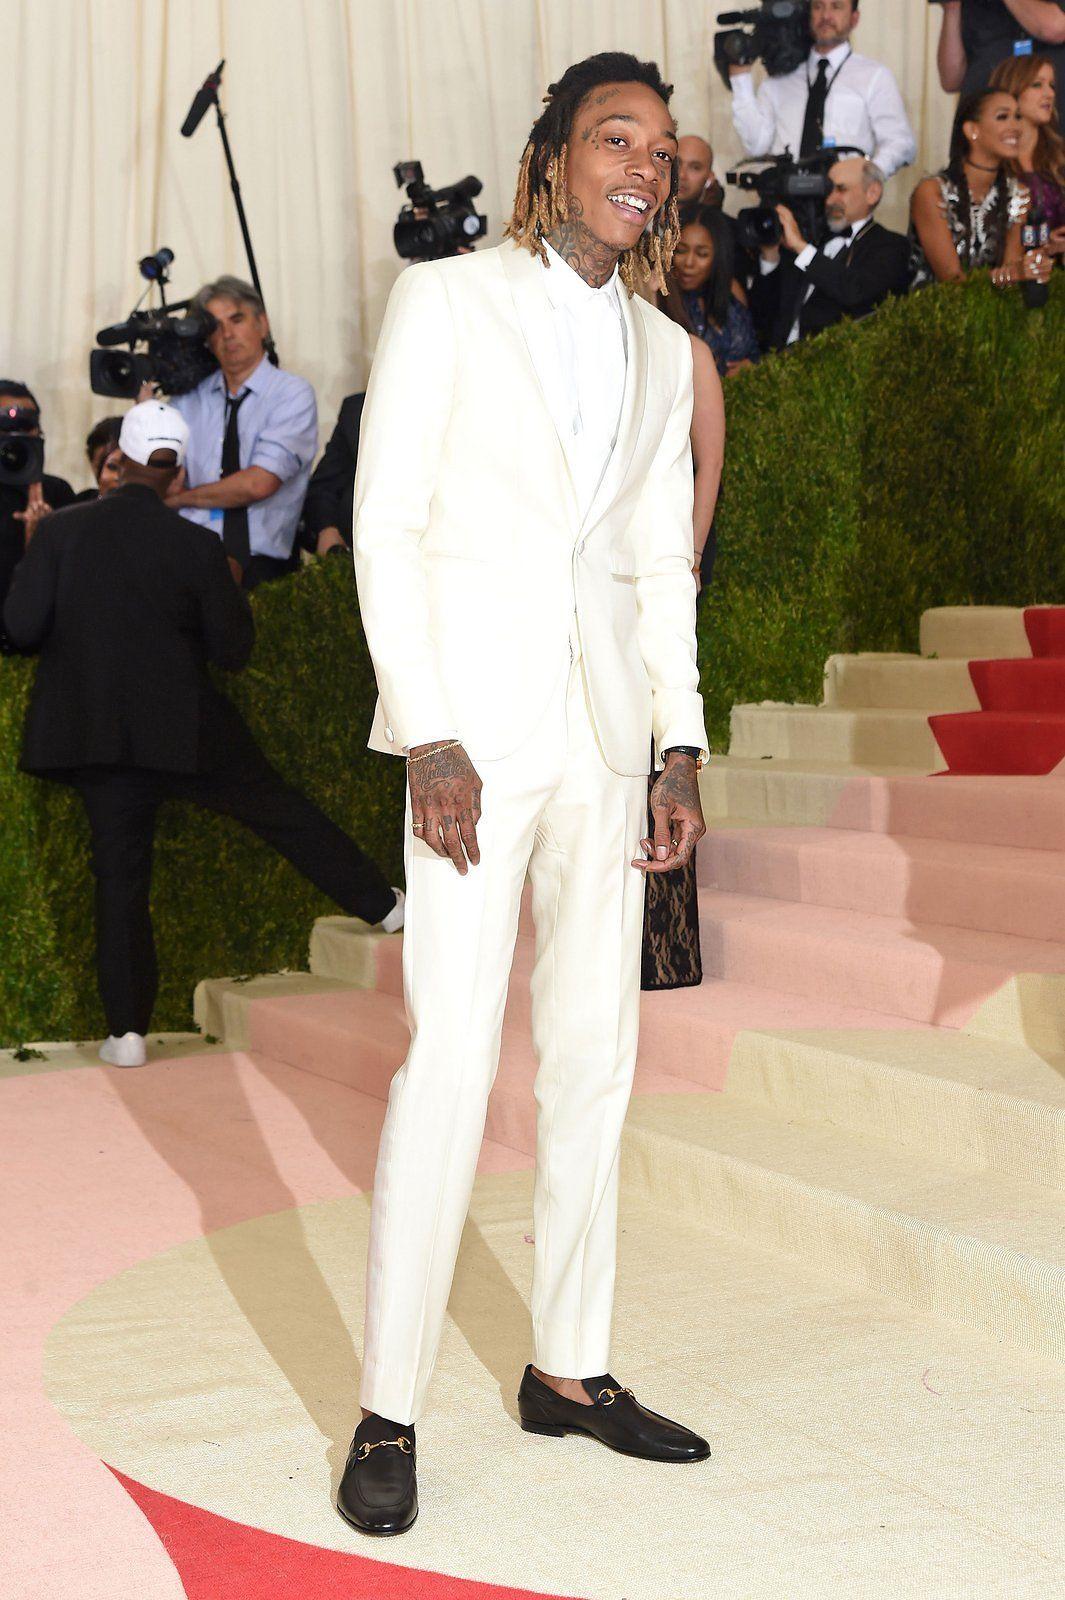 Pictures of wiz khalifa pictures of celebrities - Wiz Khalifa S Met Gala Prep Is As Cool As His Custom Suit